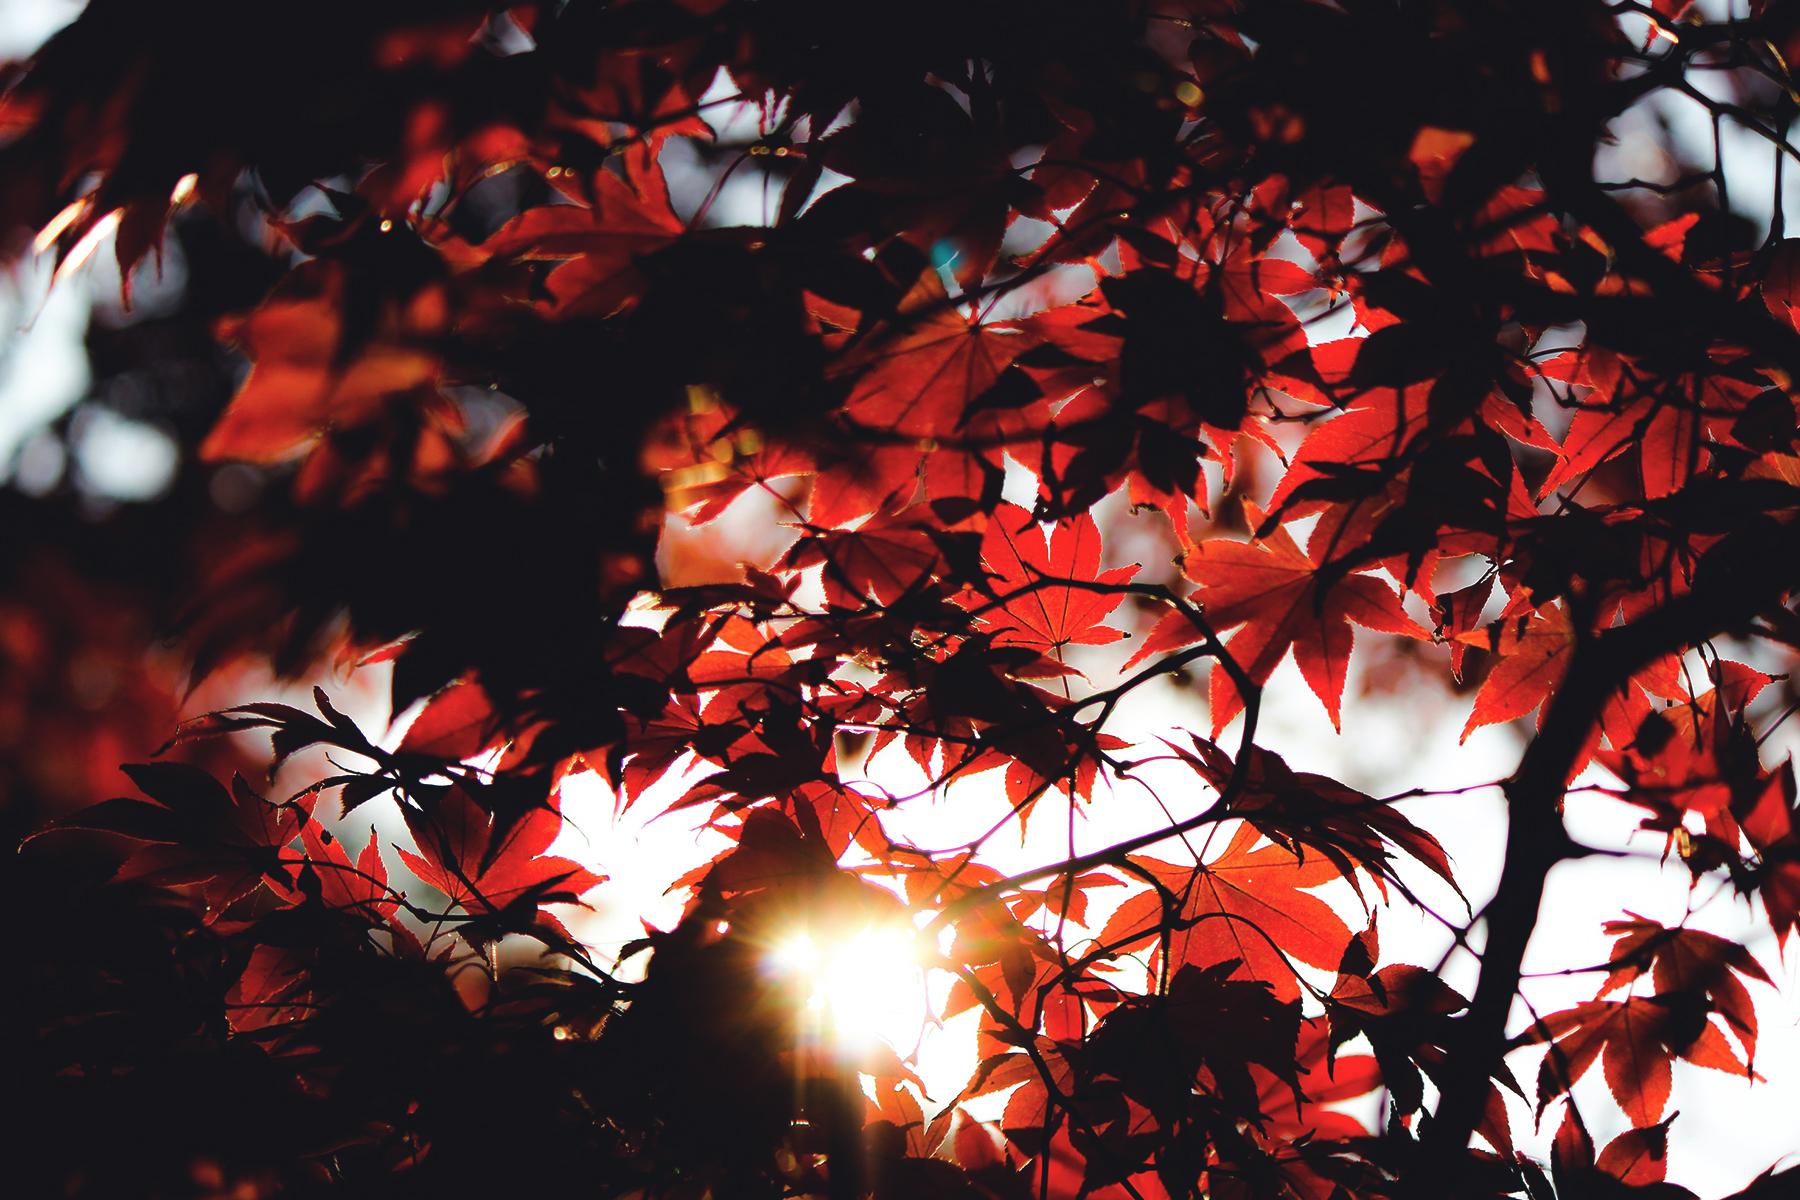 Herbst Koeln 2 Artikel – ©Unsplash